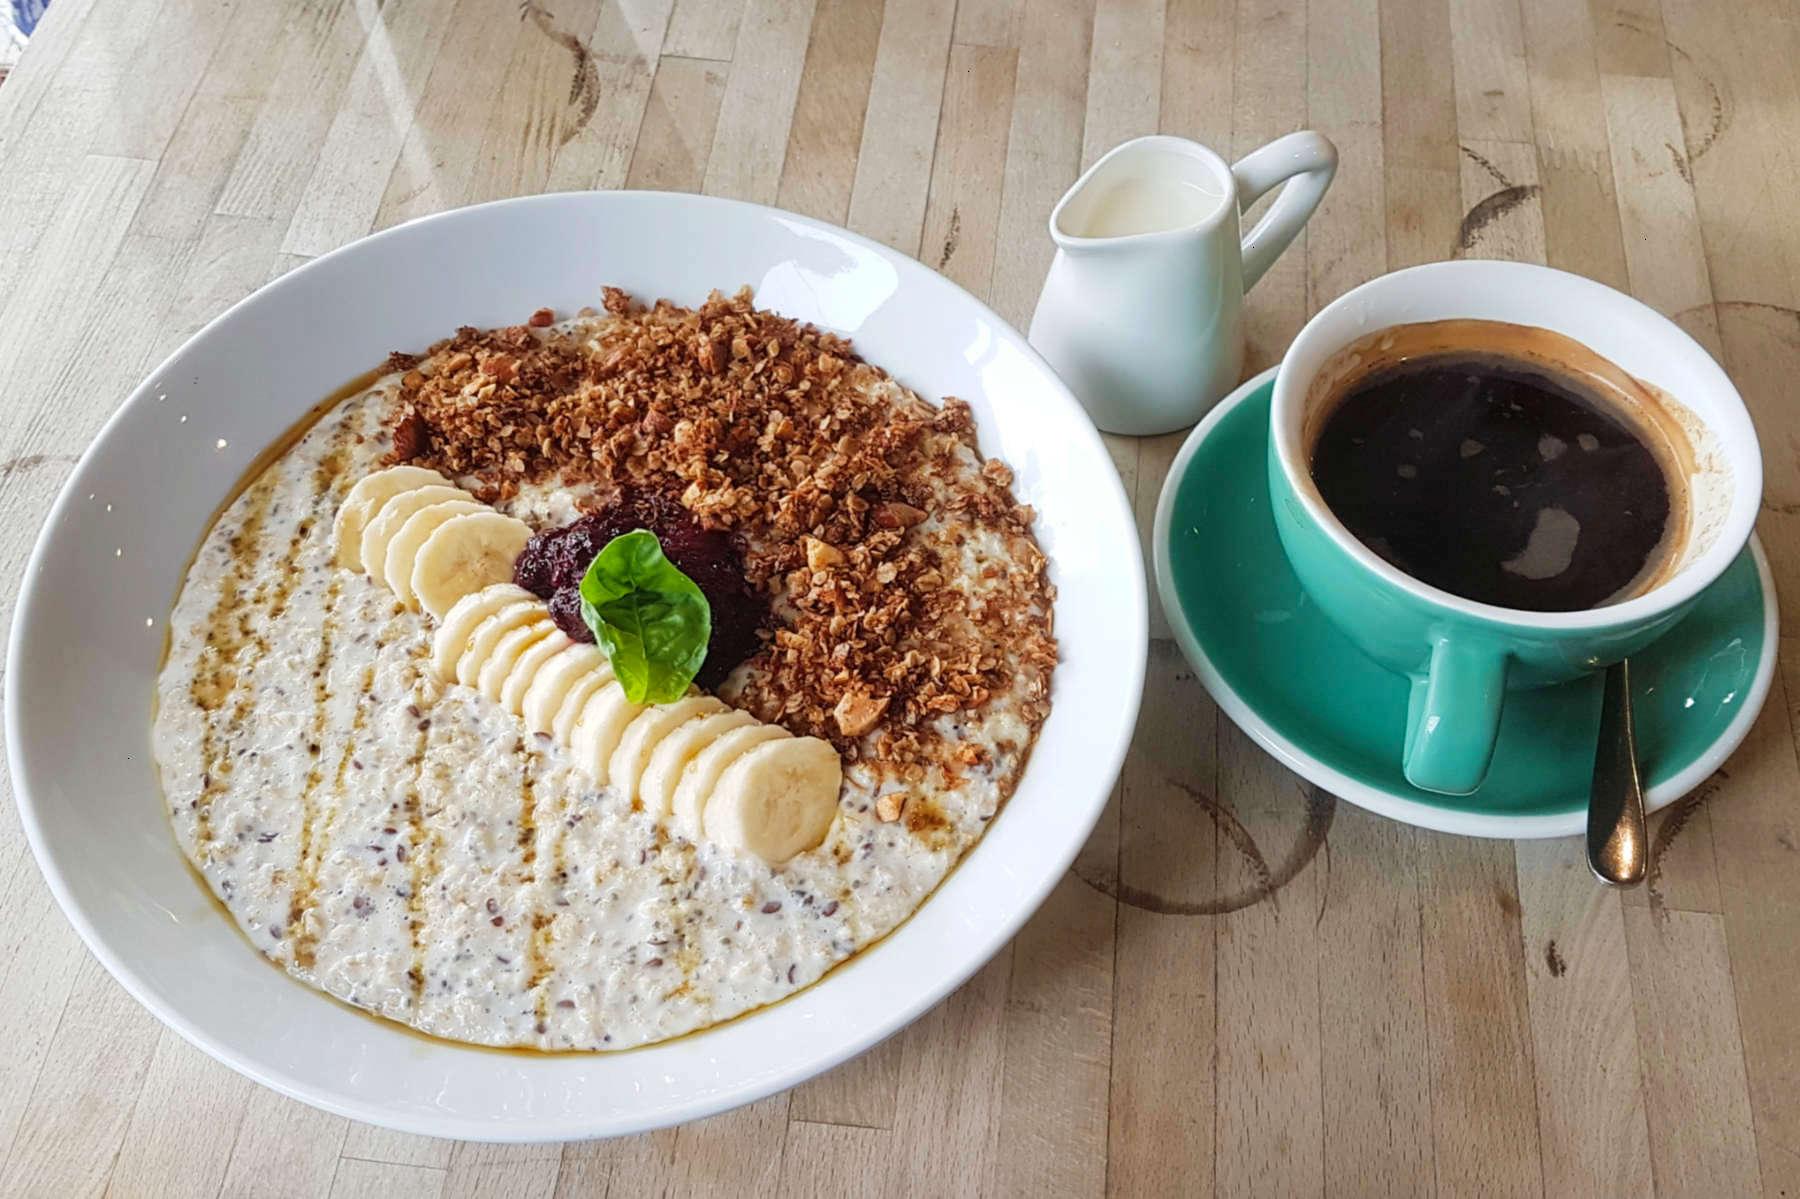 Arcimboldi - porridge and coffee